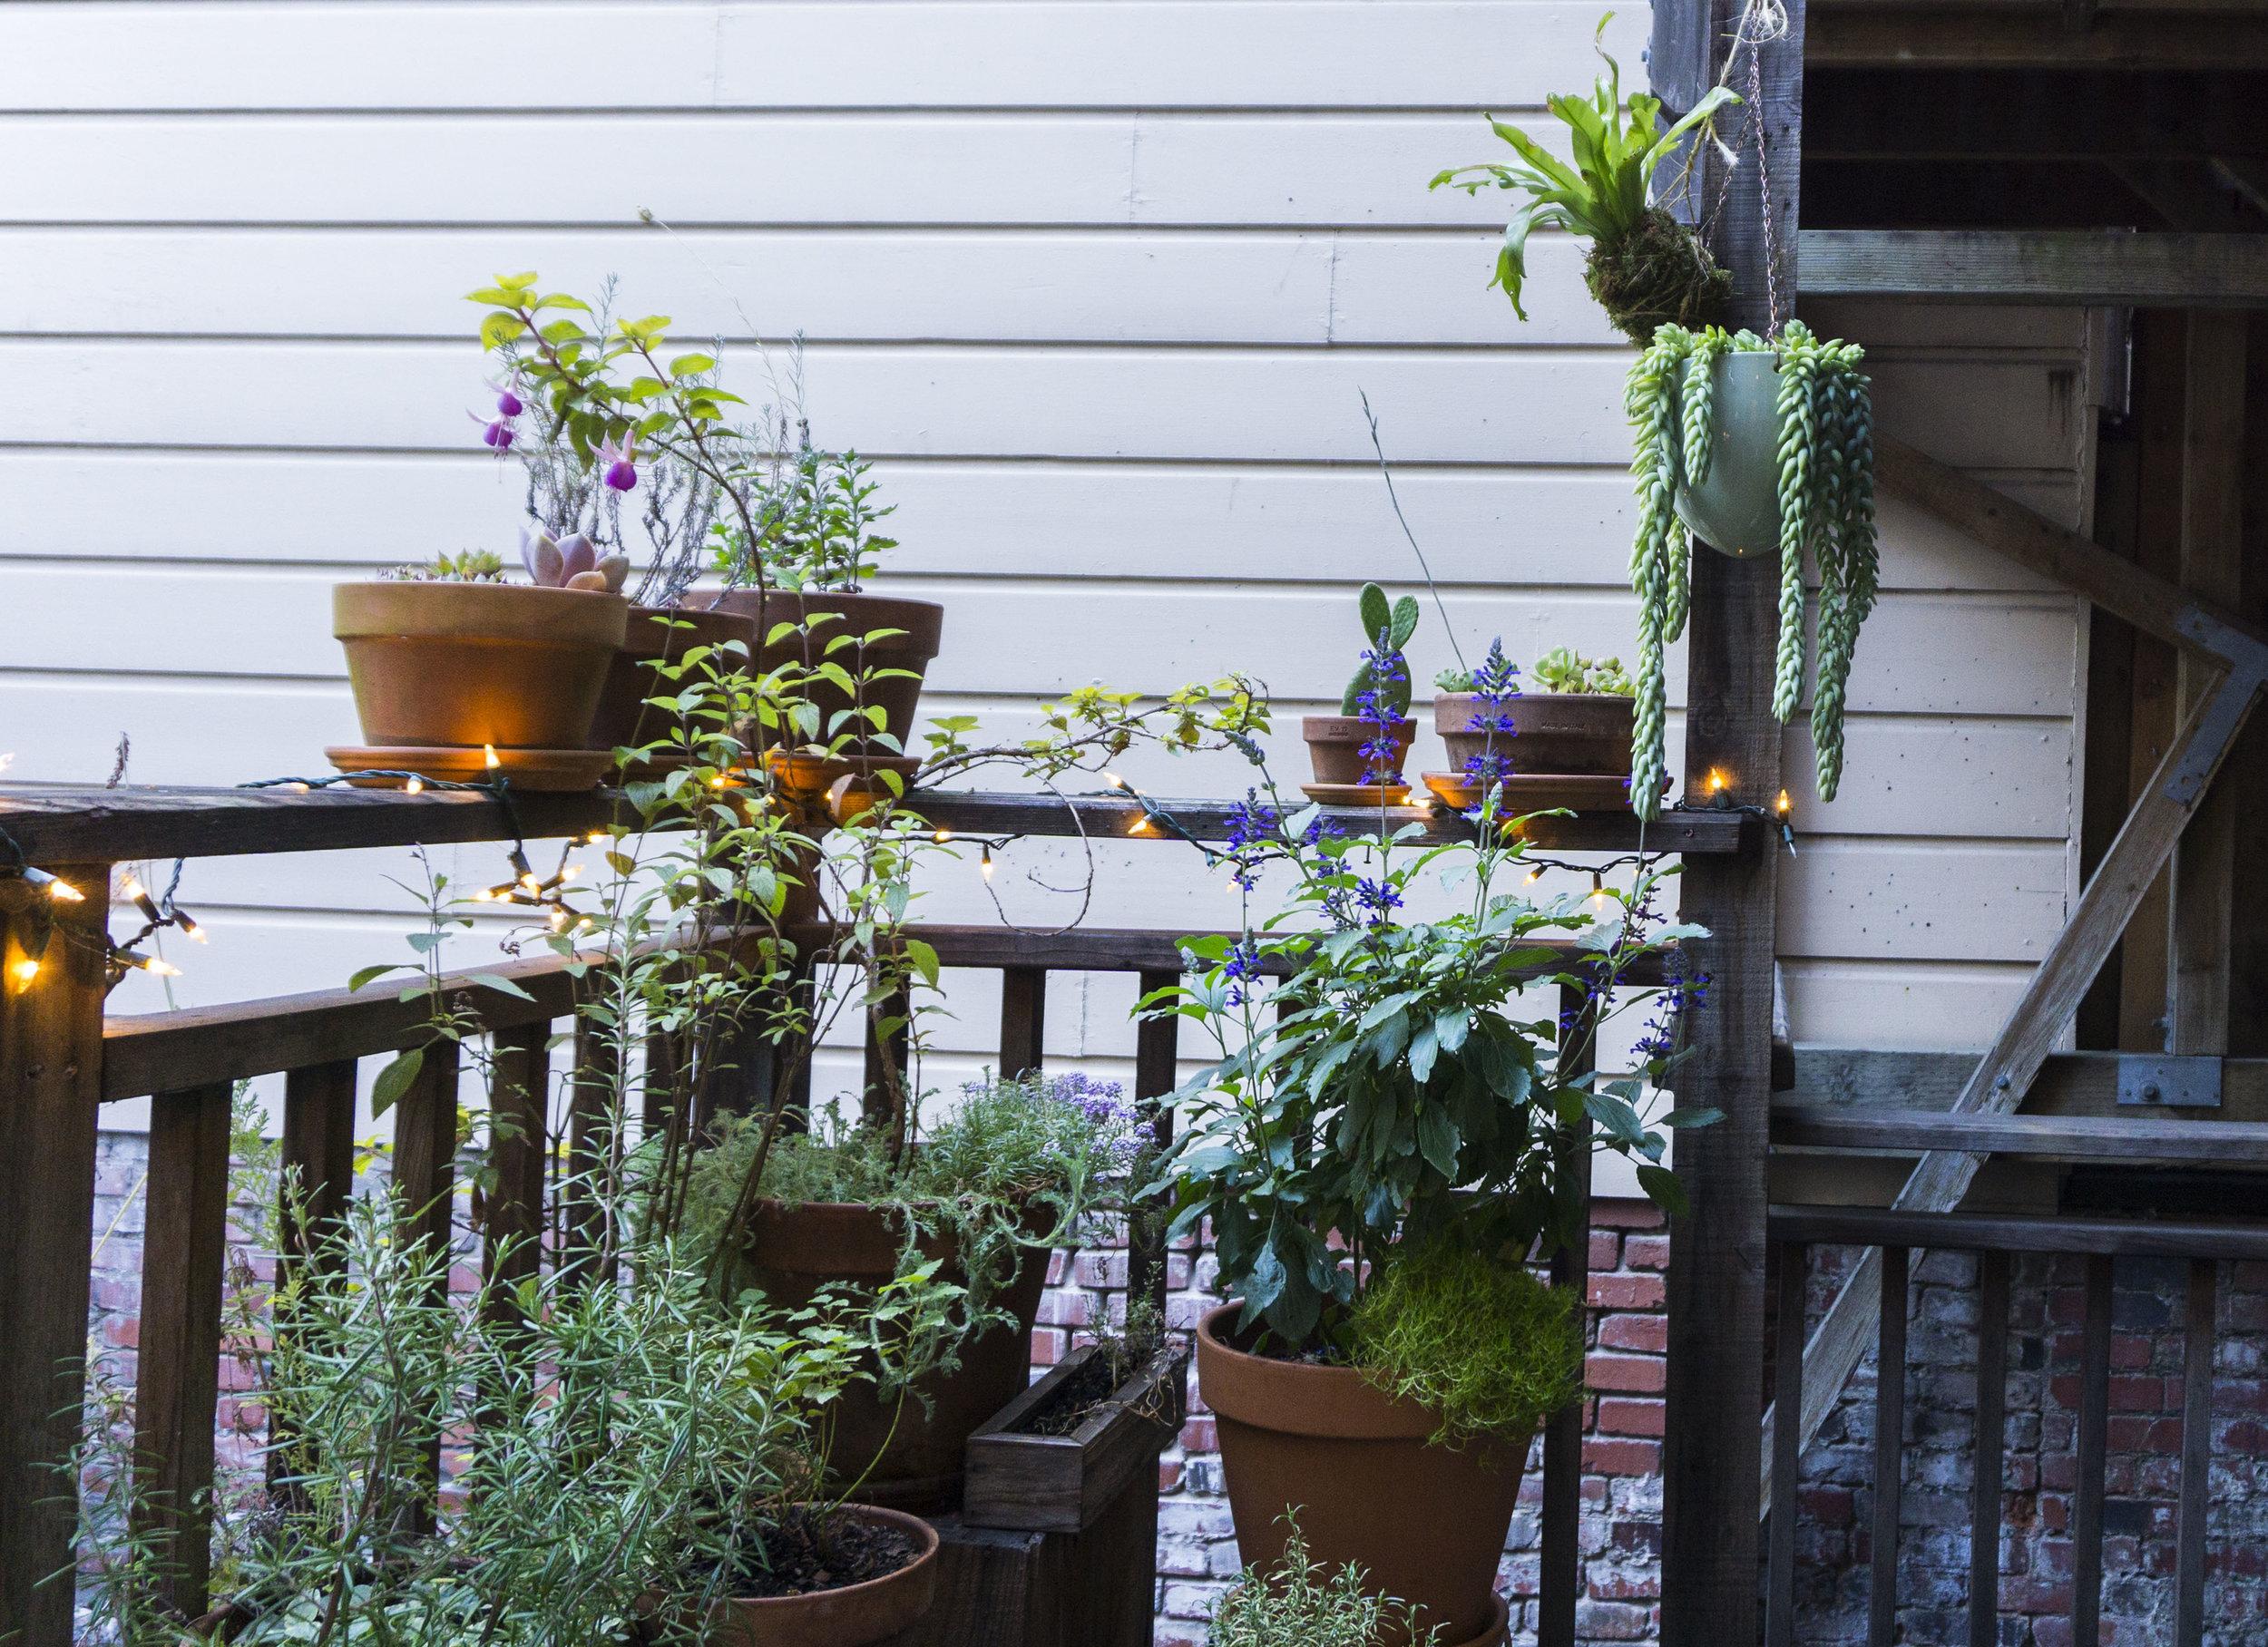 city container garden outdoor living spaces